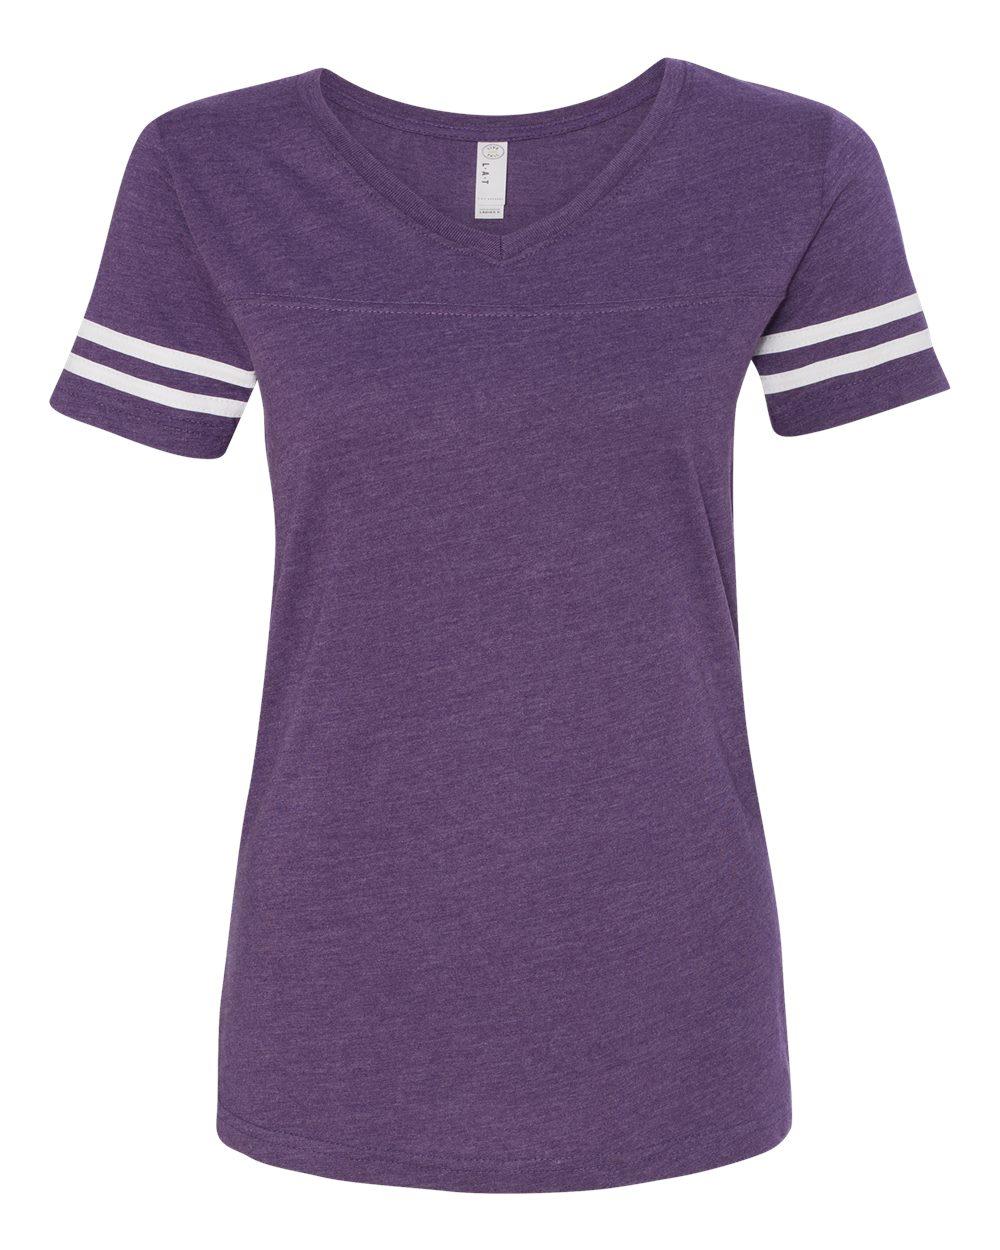 click to view Vintage Purple/White